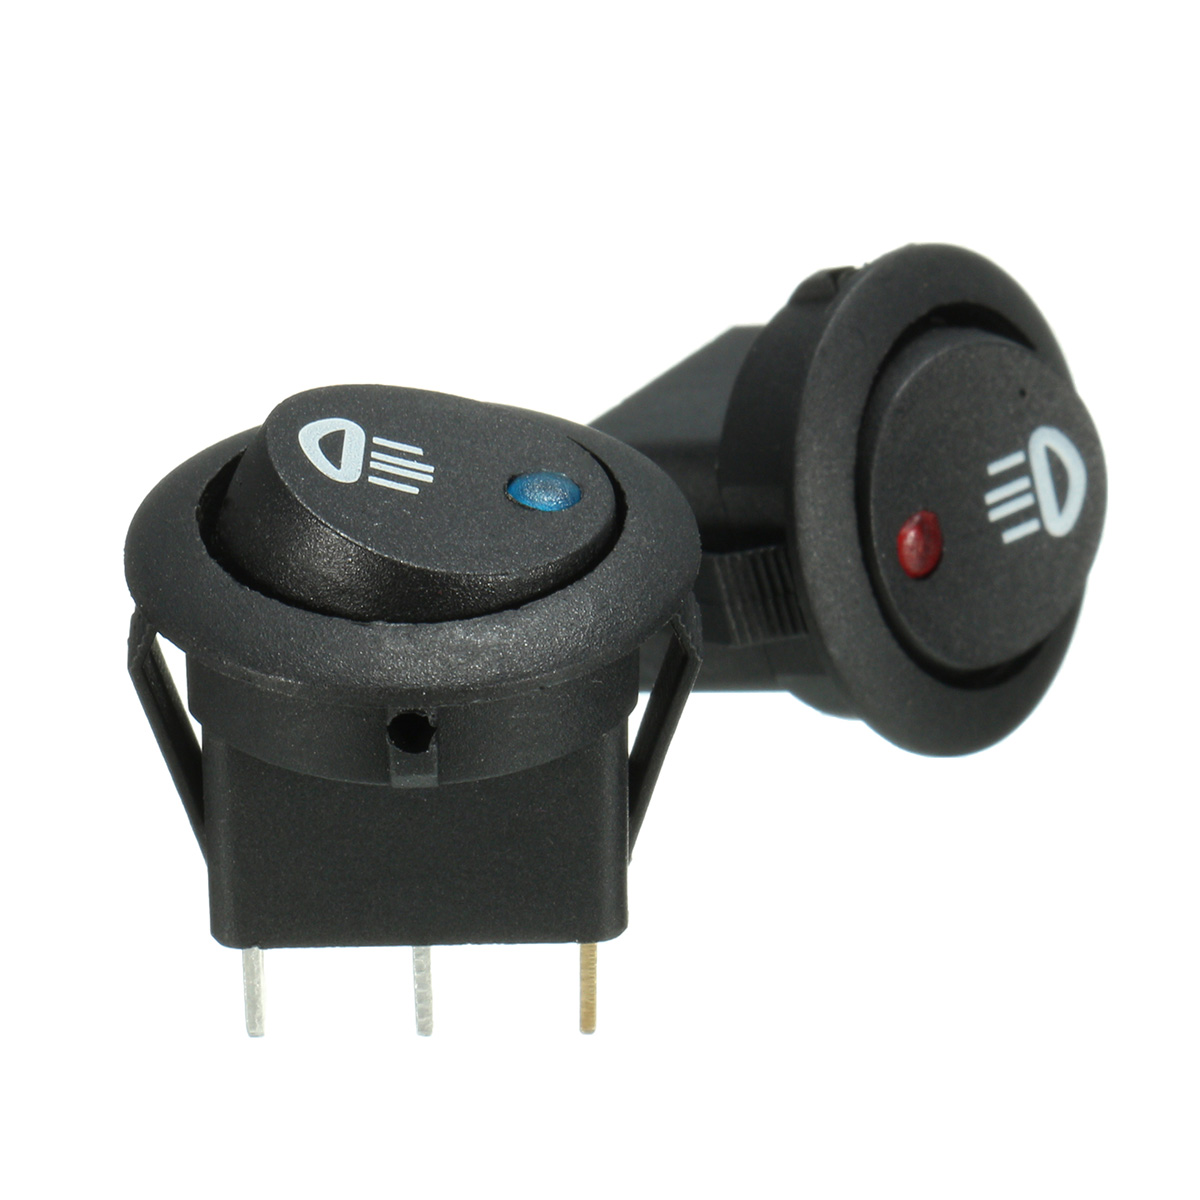 5x ON//OFF Round Rocker Switch LED illuminated Car Dashboard Dash Boat Van 12V//yL